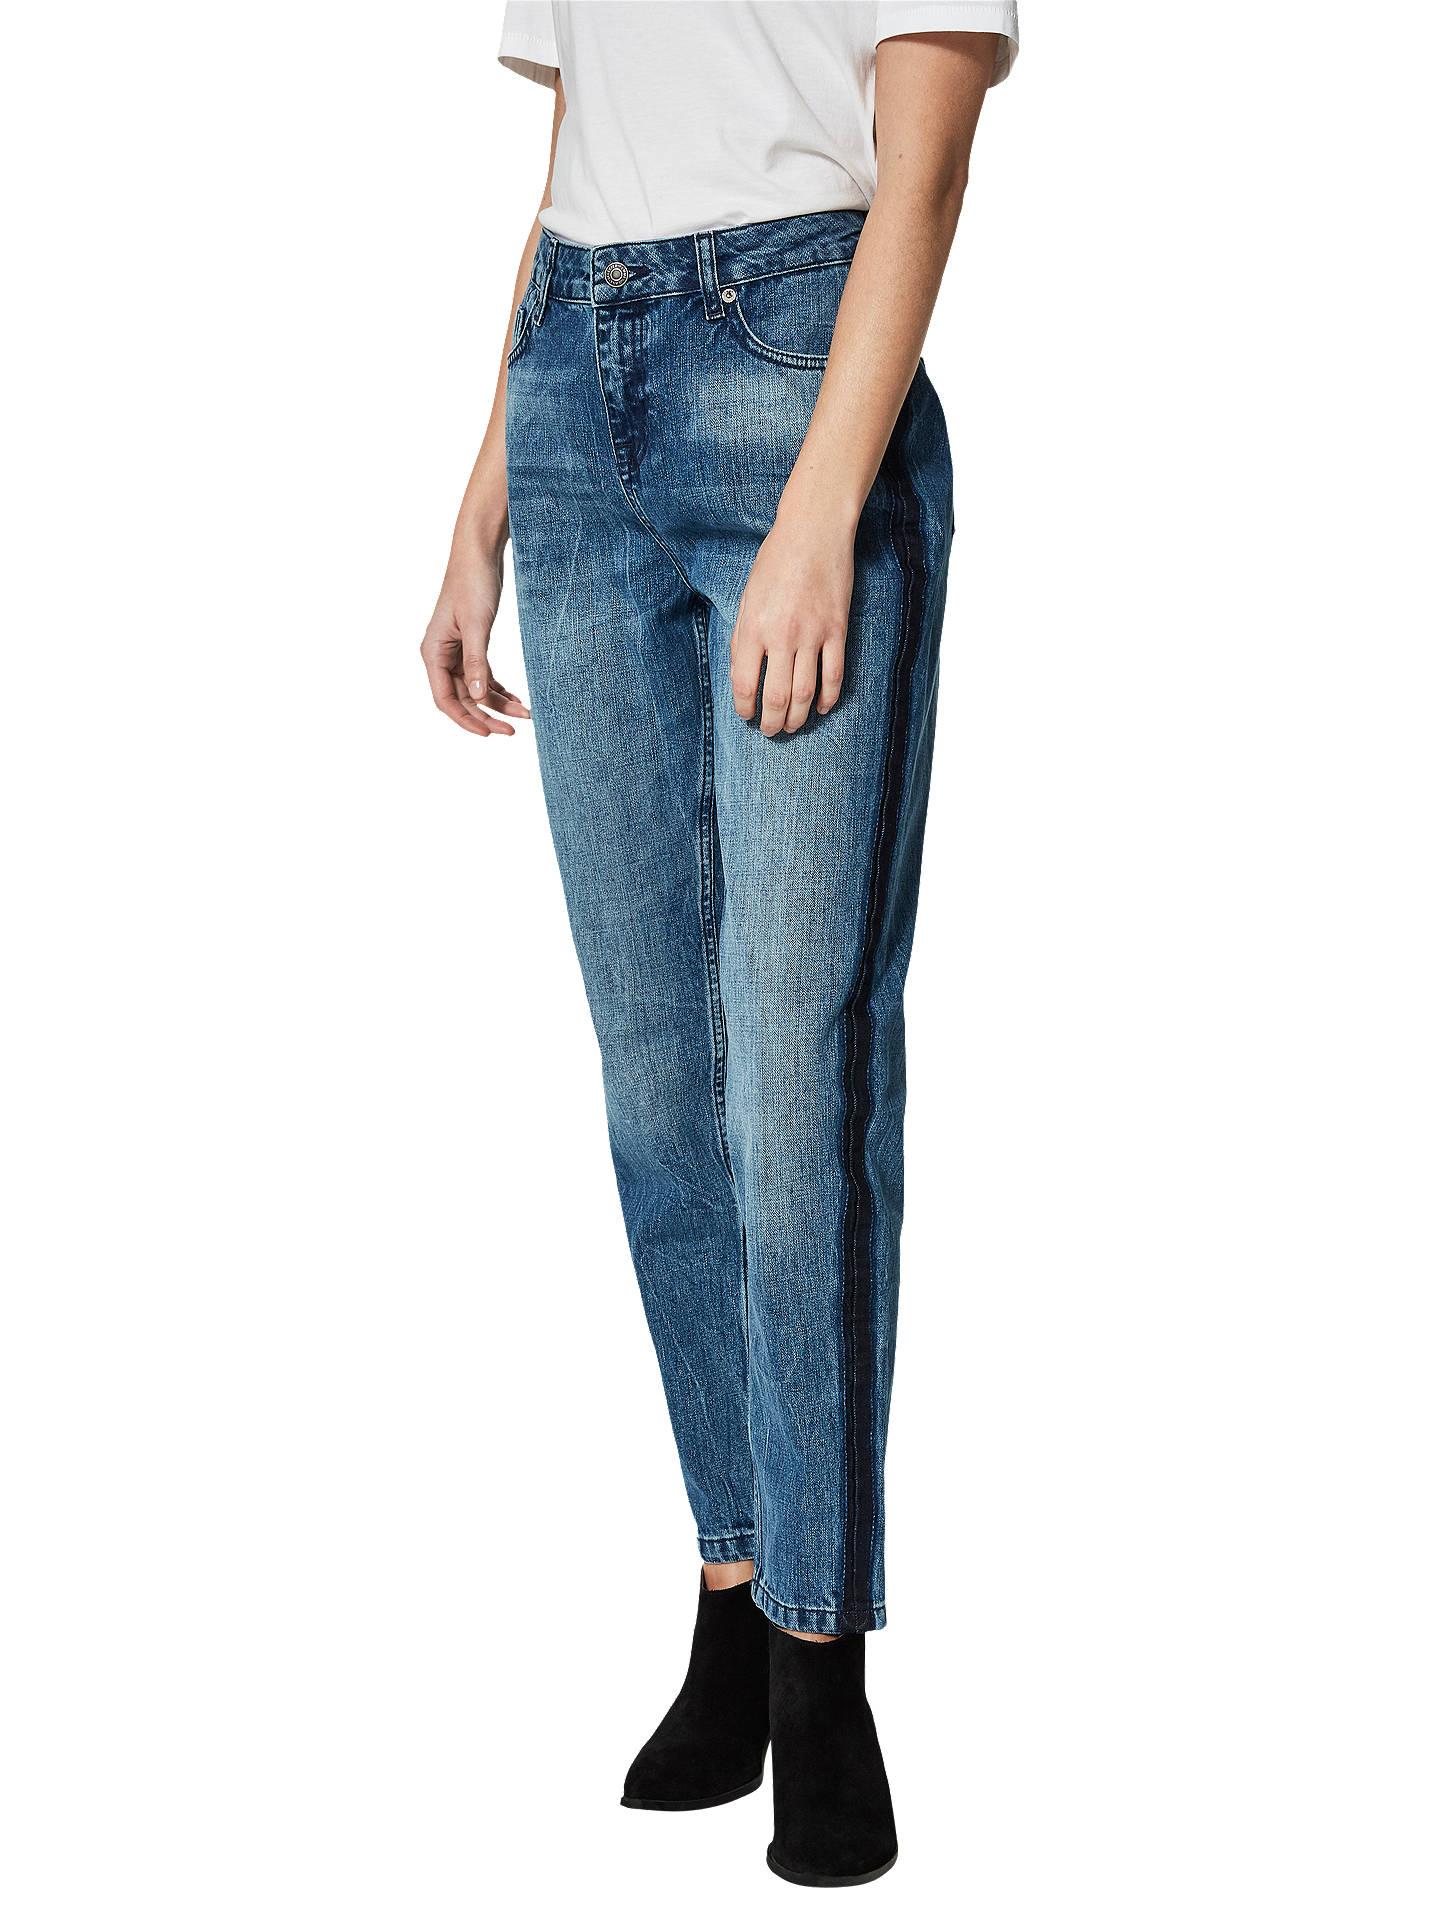 2bd2b2a2f0a Buy Selected Femme Roy Boyfriend Jeans